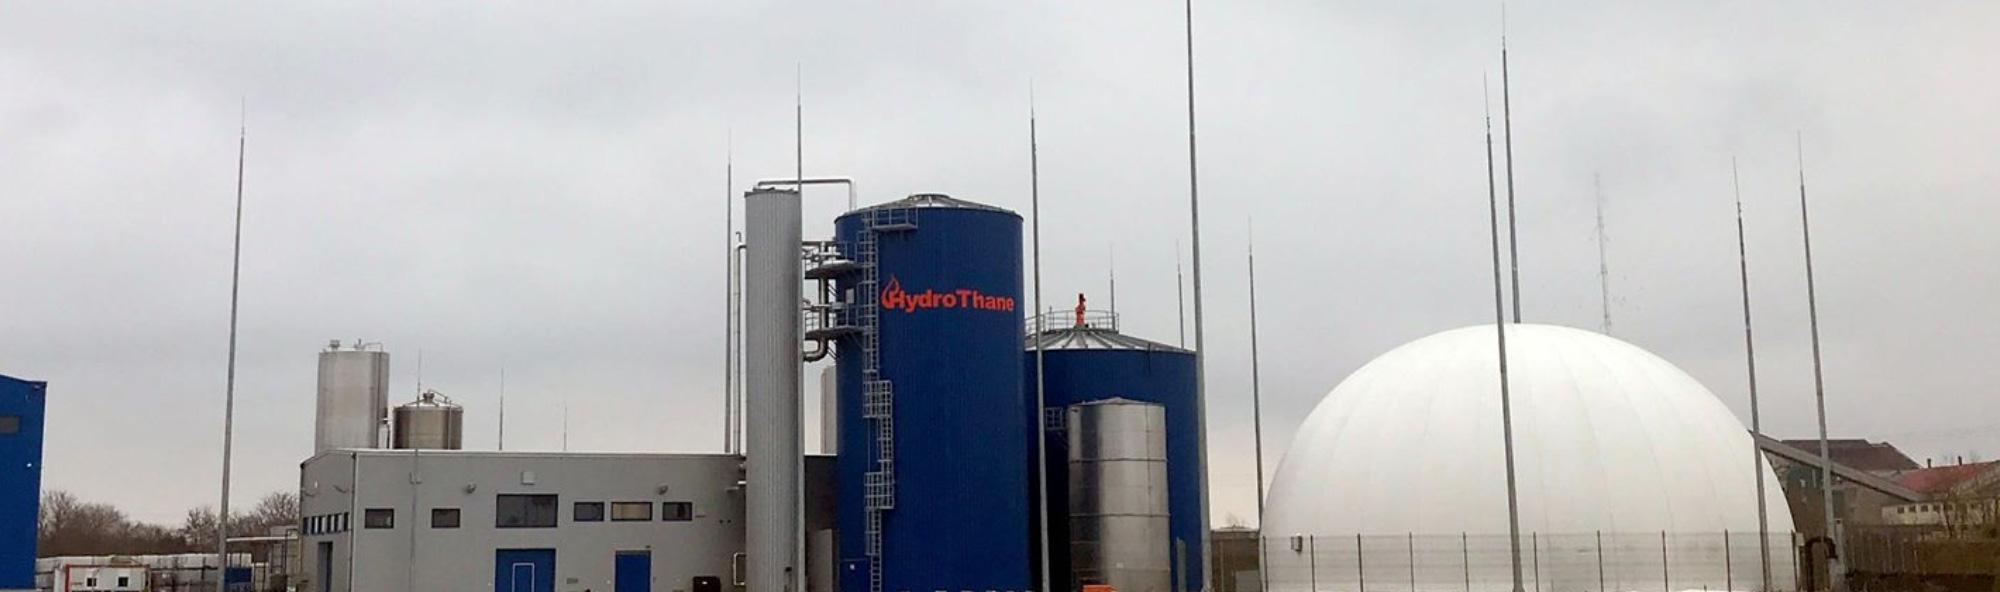 hydrothane biogaz romania